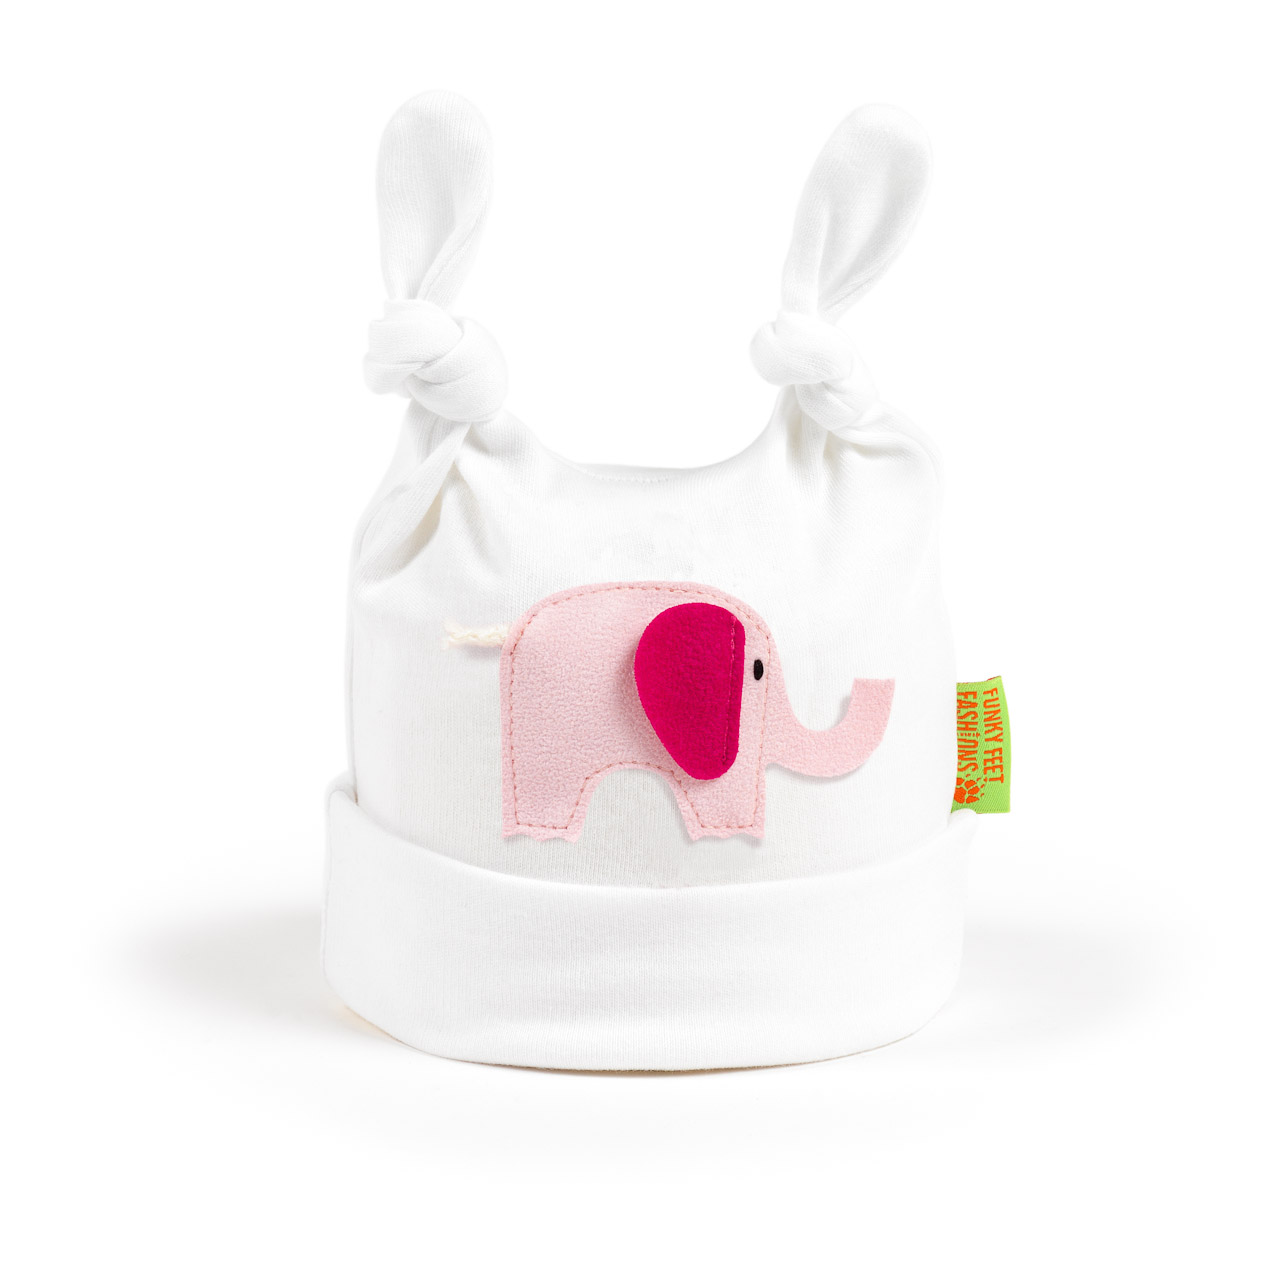 Ellie-Hat-White-Pink-Web